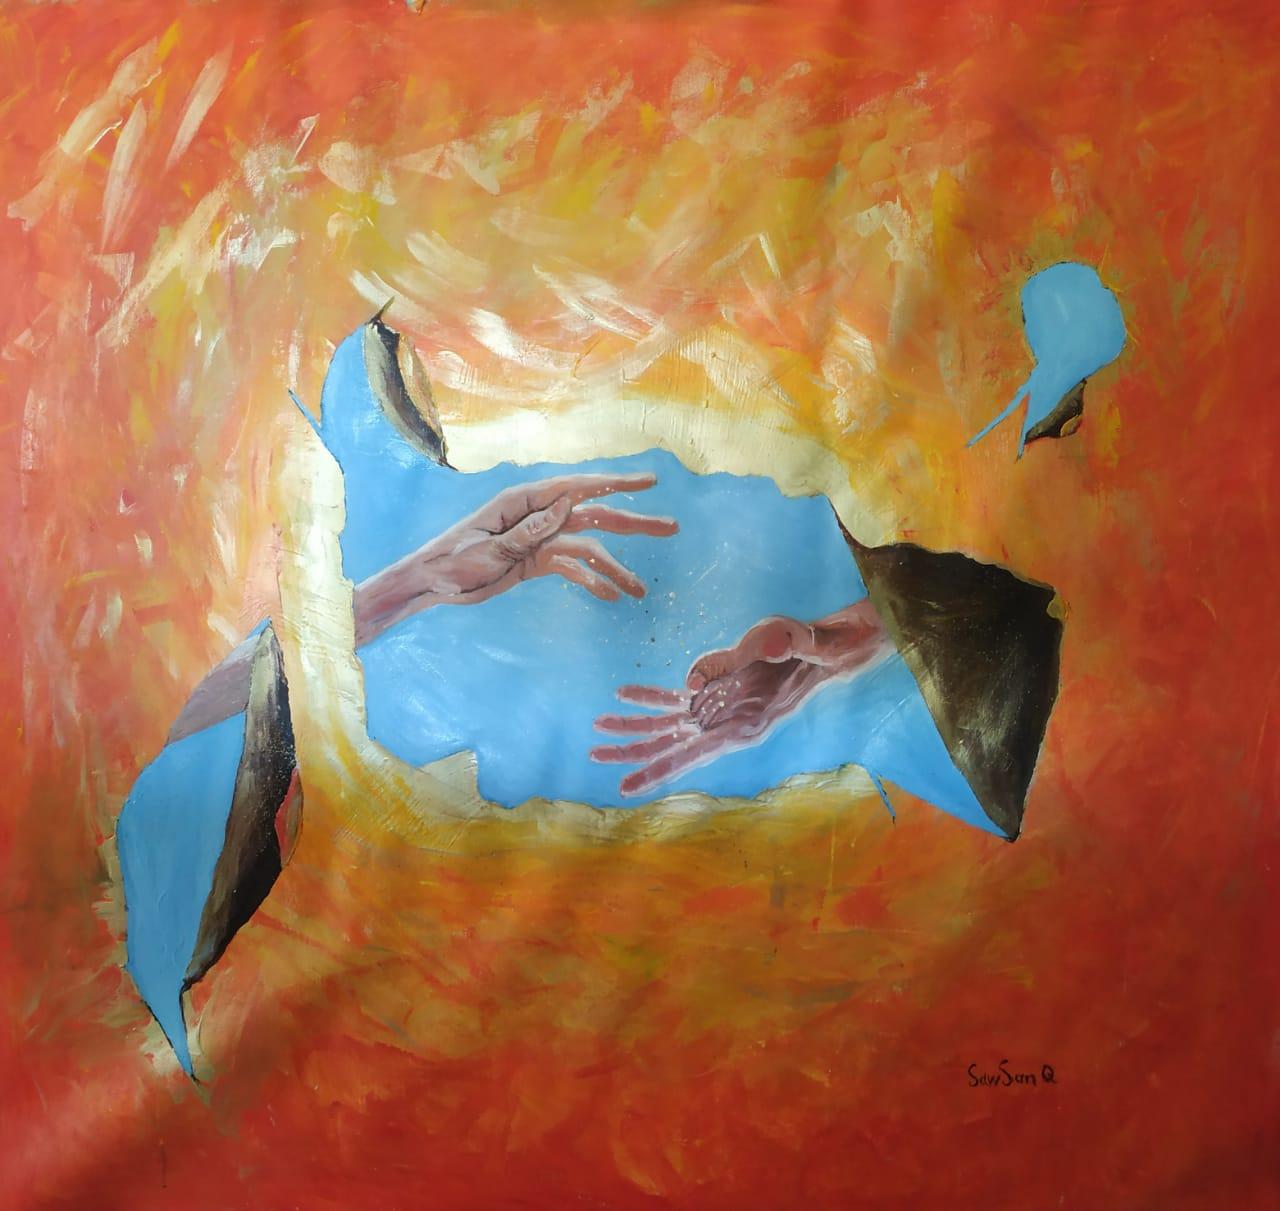 Kulturna citanka Sawsan-Art-Abstract-Paintings-1-2